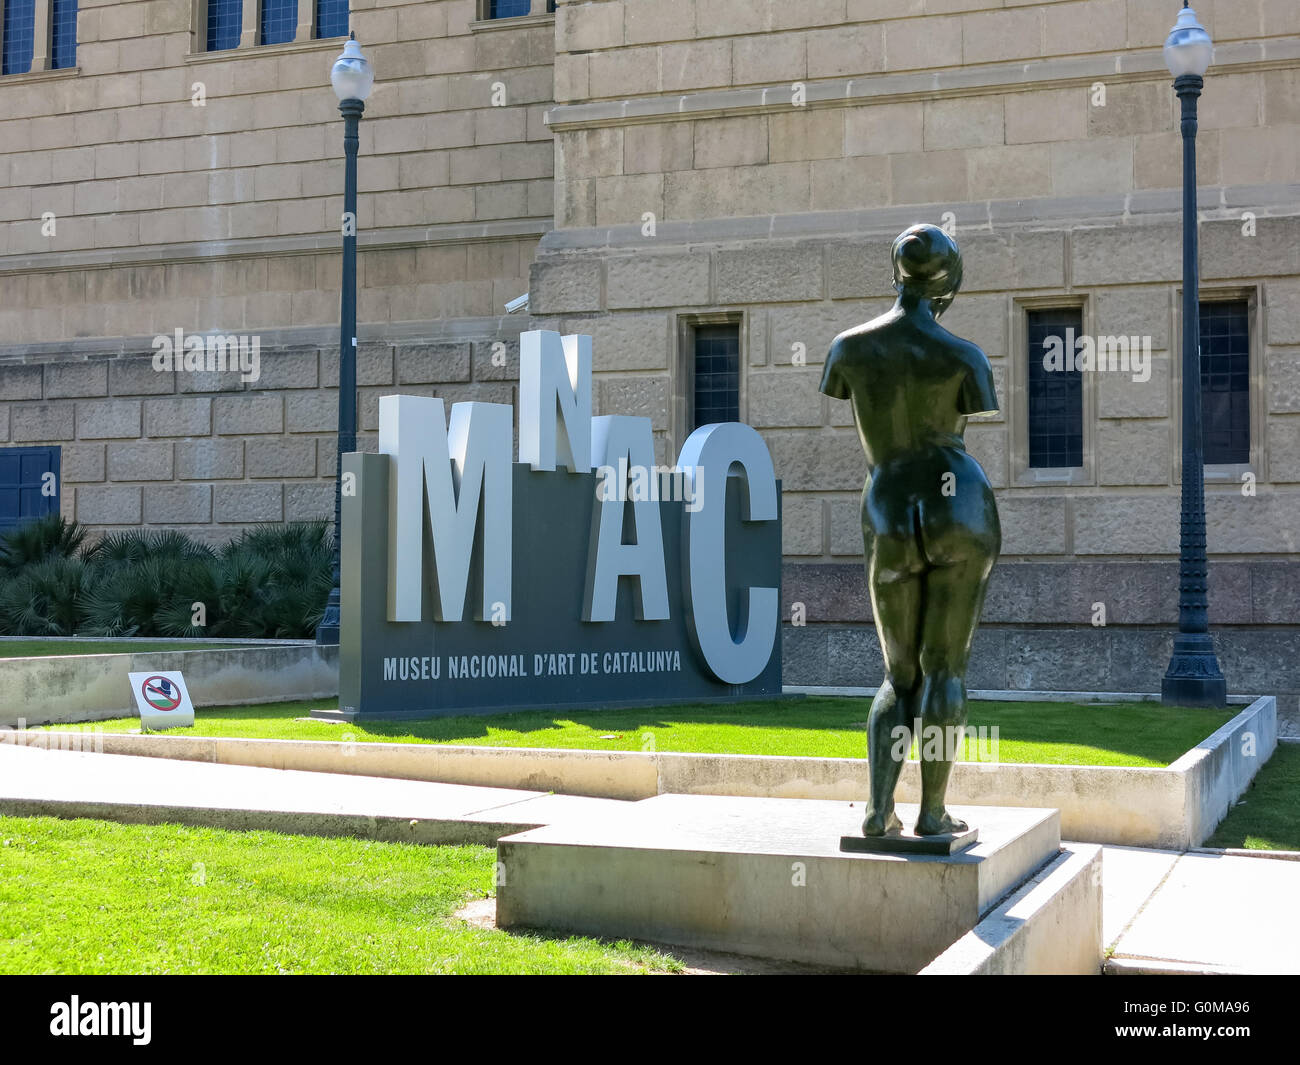 Museu Nacional d'Art de Catalunya or National Art Museum MNAC, in Barcelona, Catalonia, Spain - Stock Image